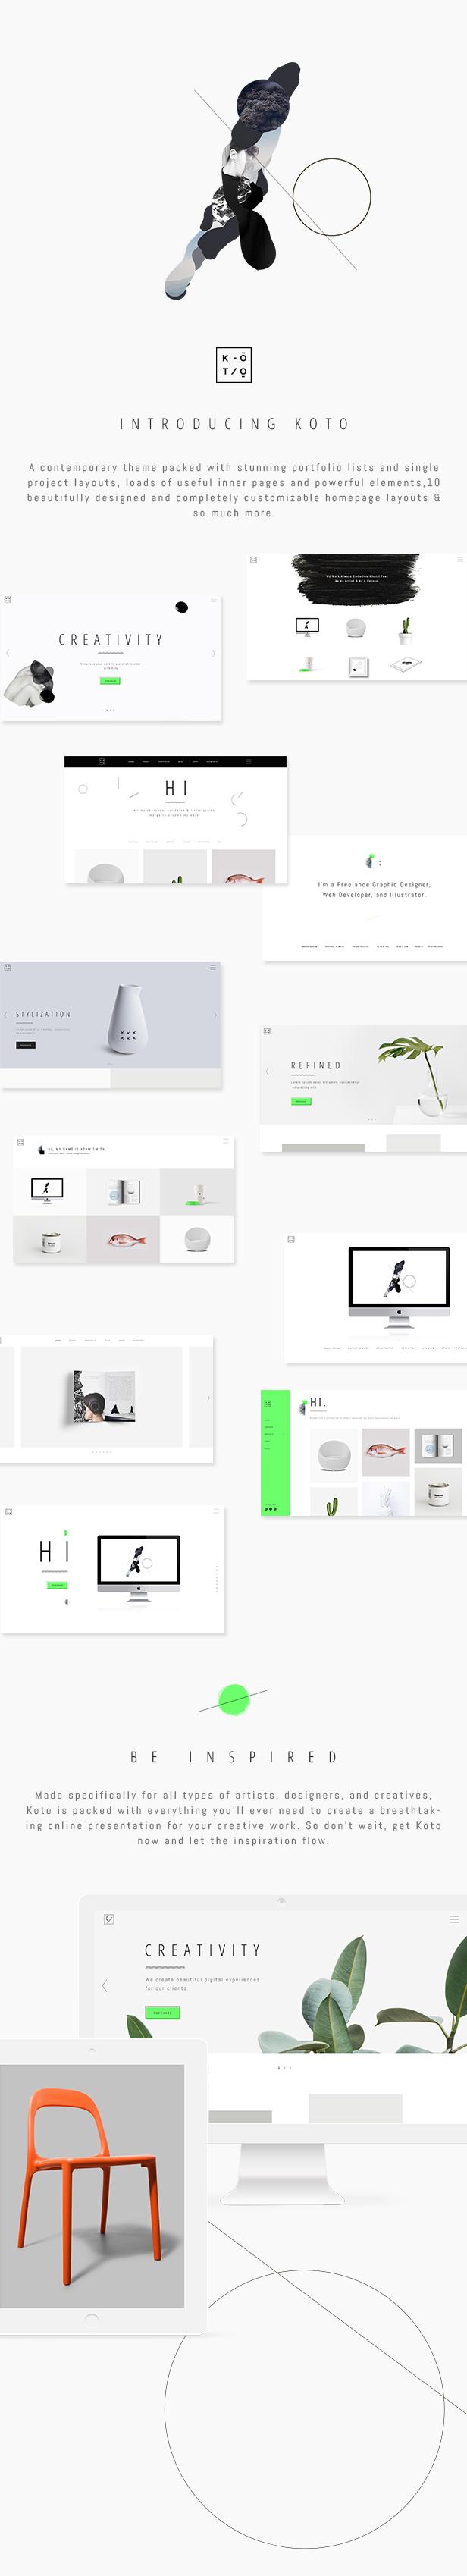 Koto - Artist and Designer Portfolio Theme - 1